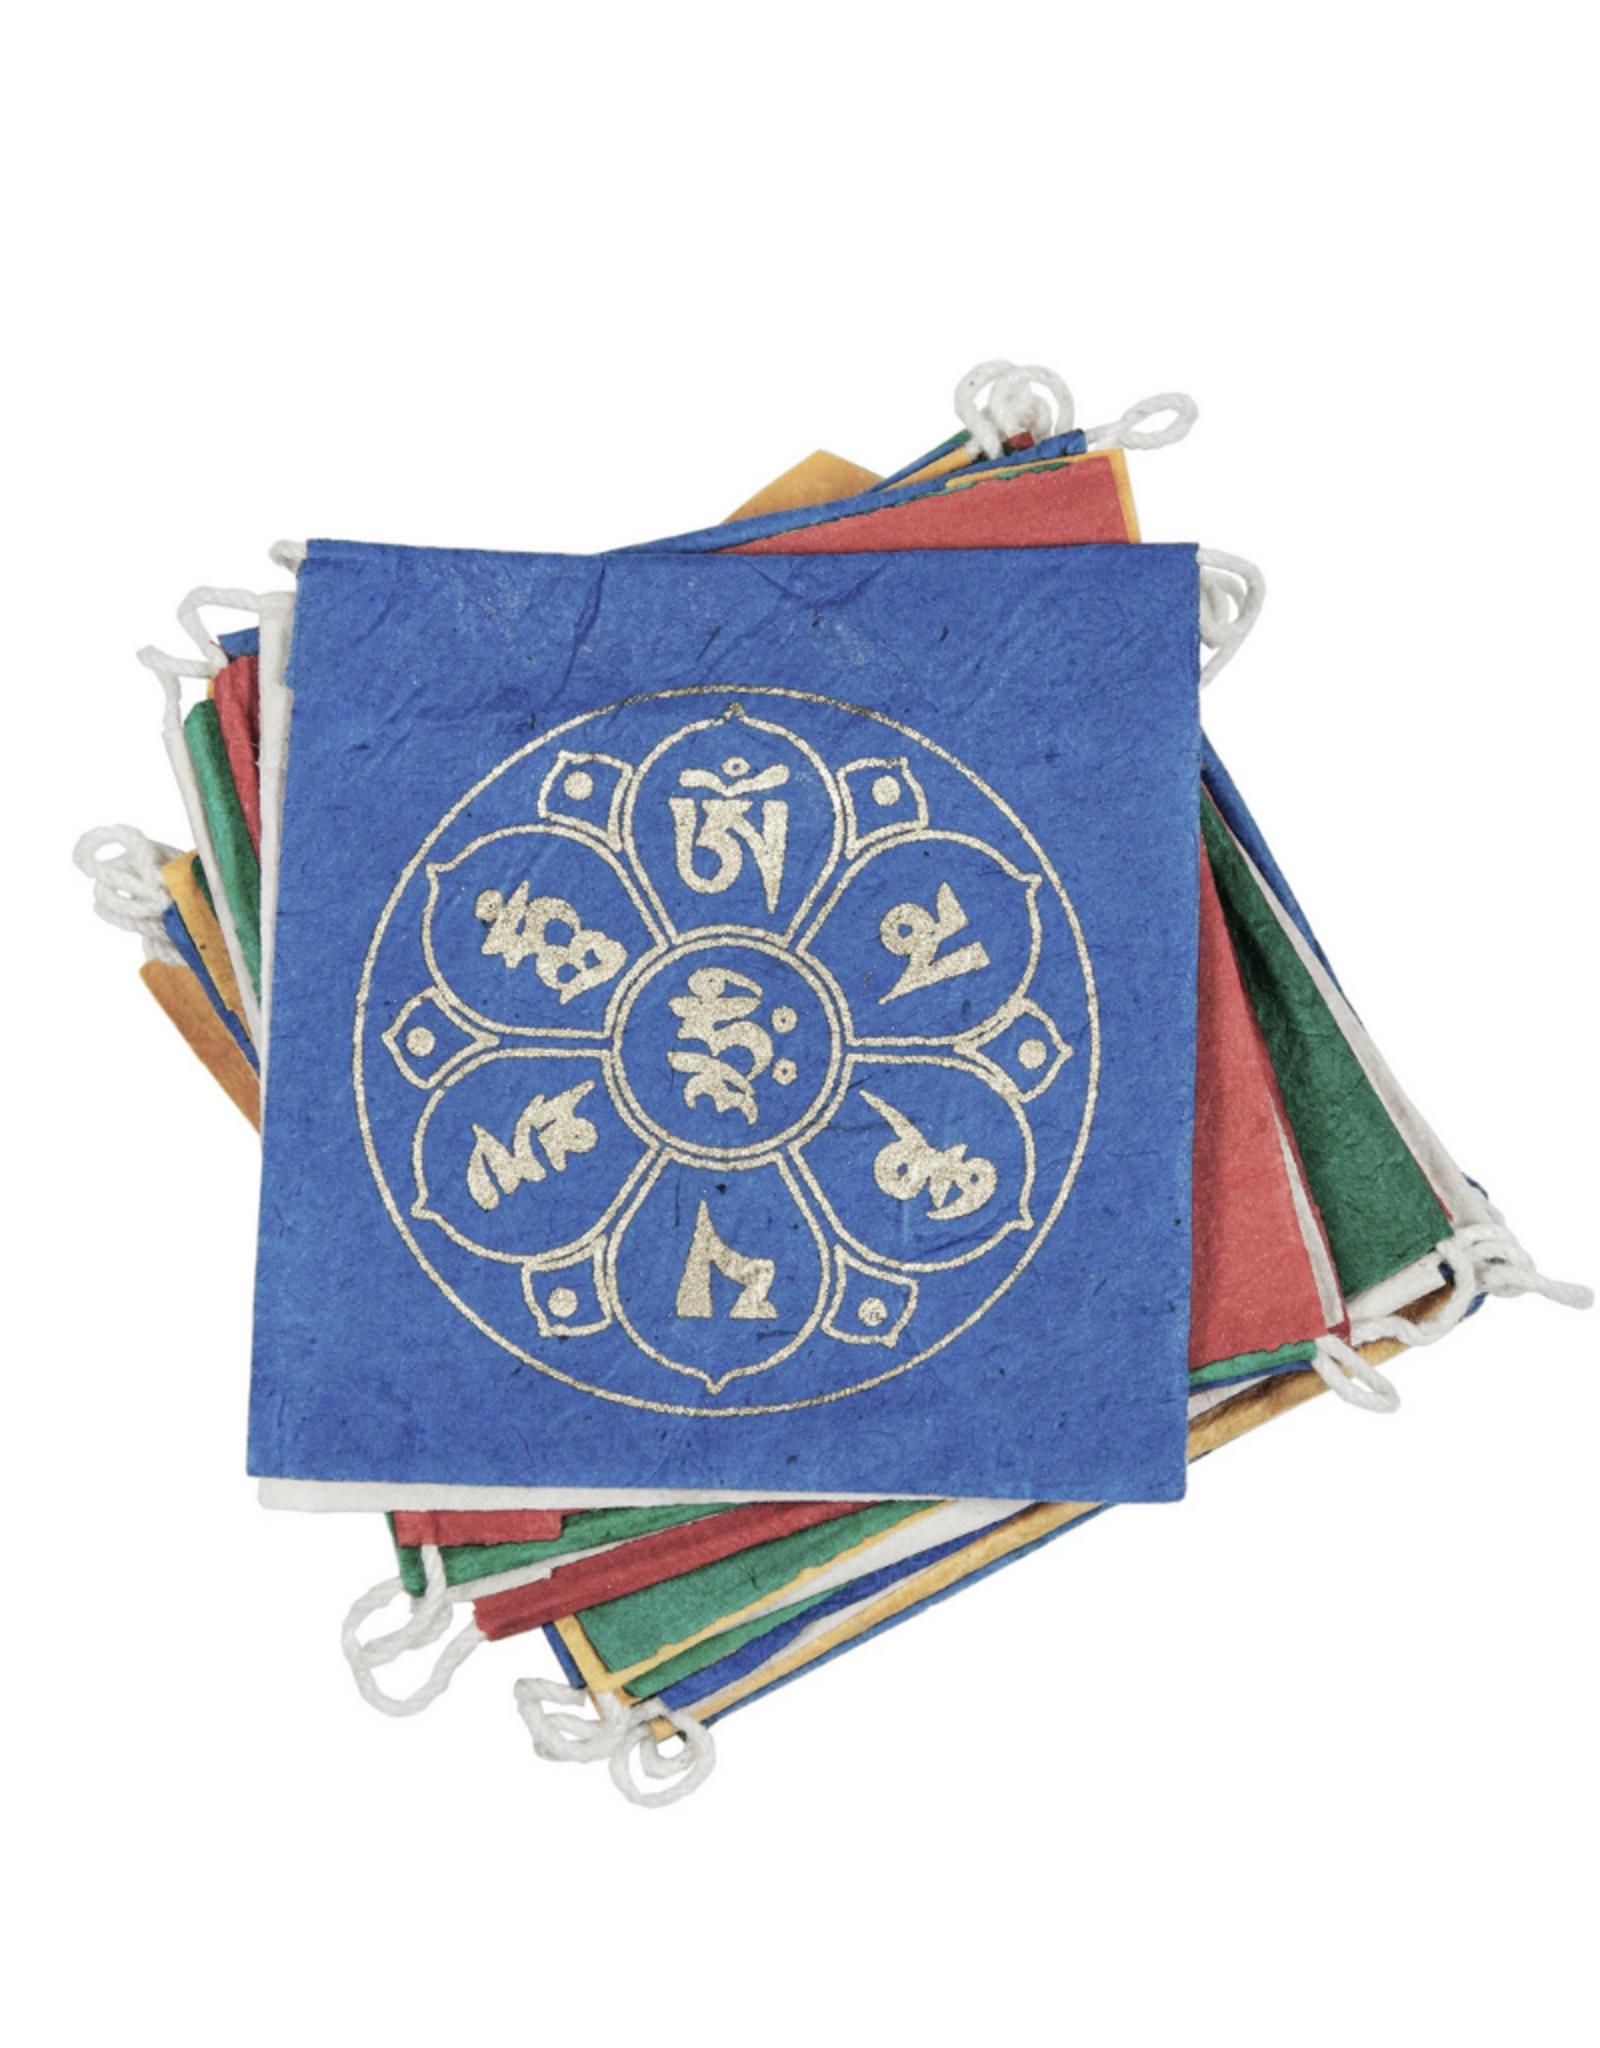 Global Crafts Prayer Flag, Lotus Paper 8' long